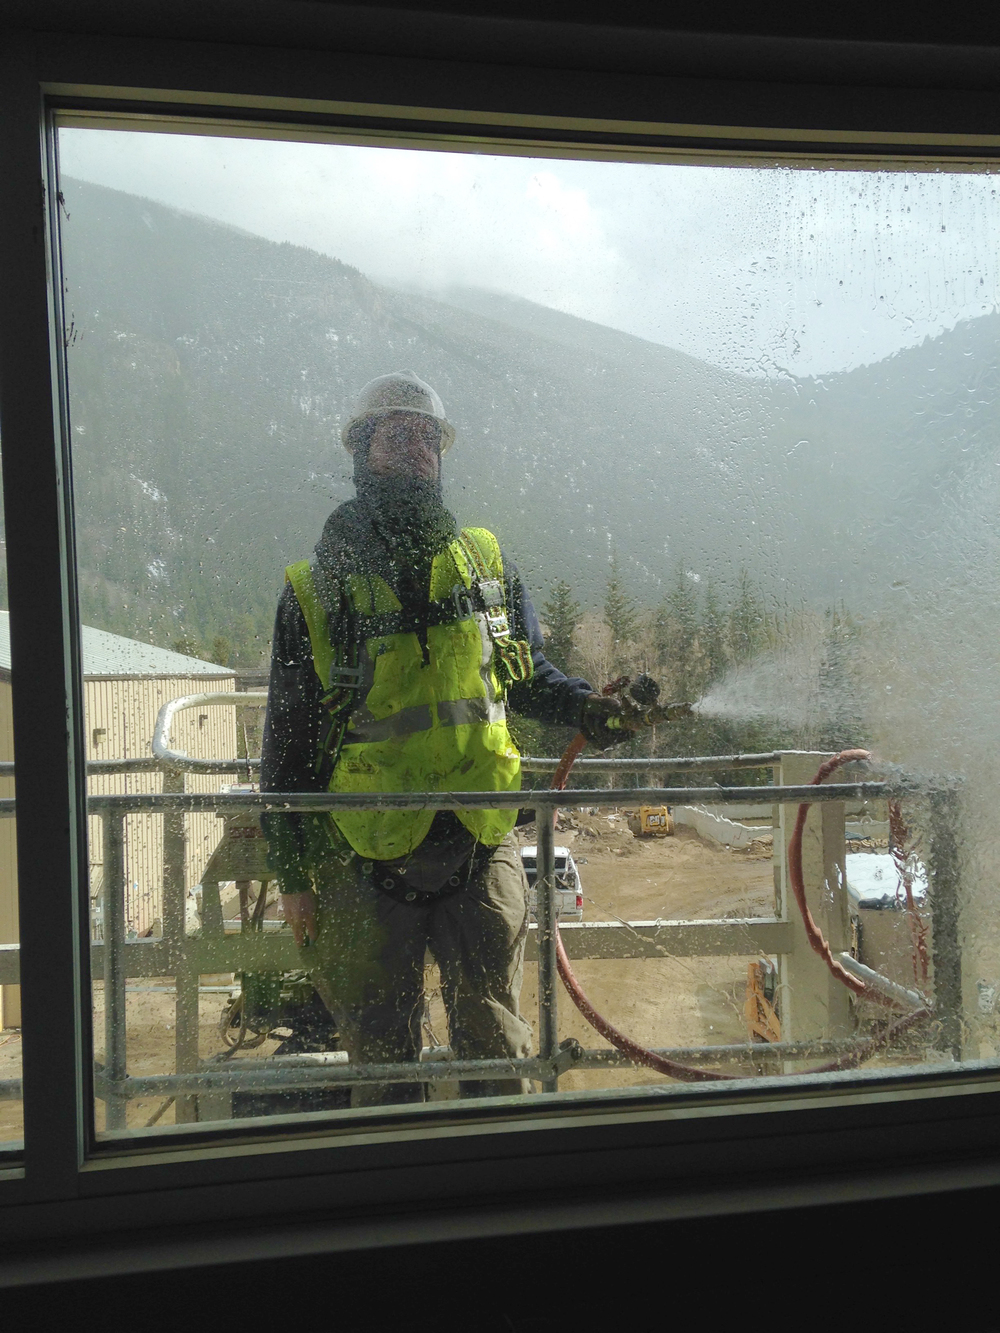 CDOT Vehicle Maintenance Facility & Sand Shed, Empire, Colorado